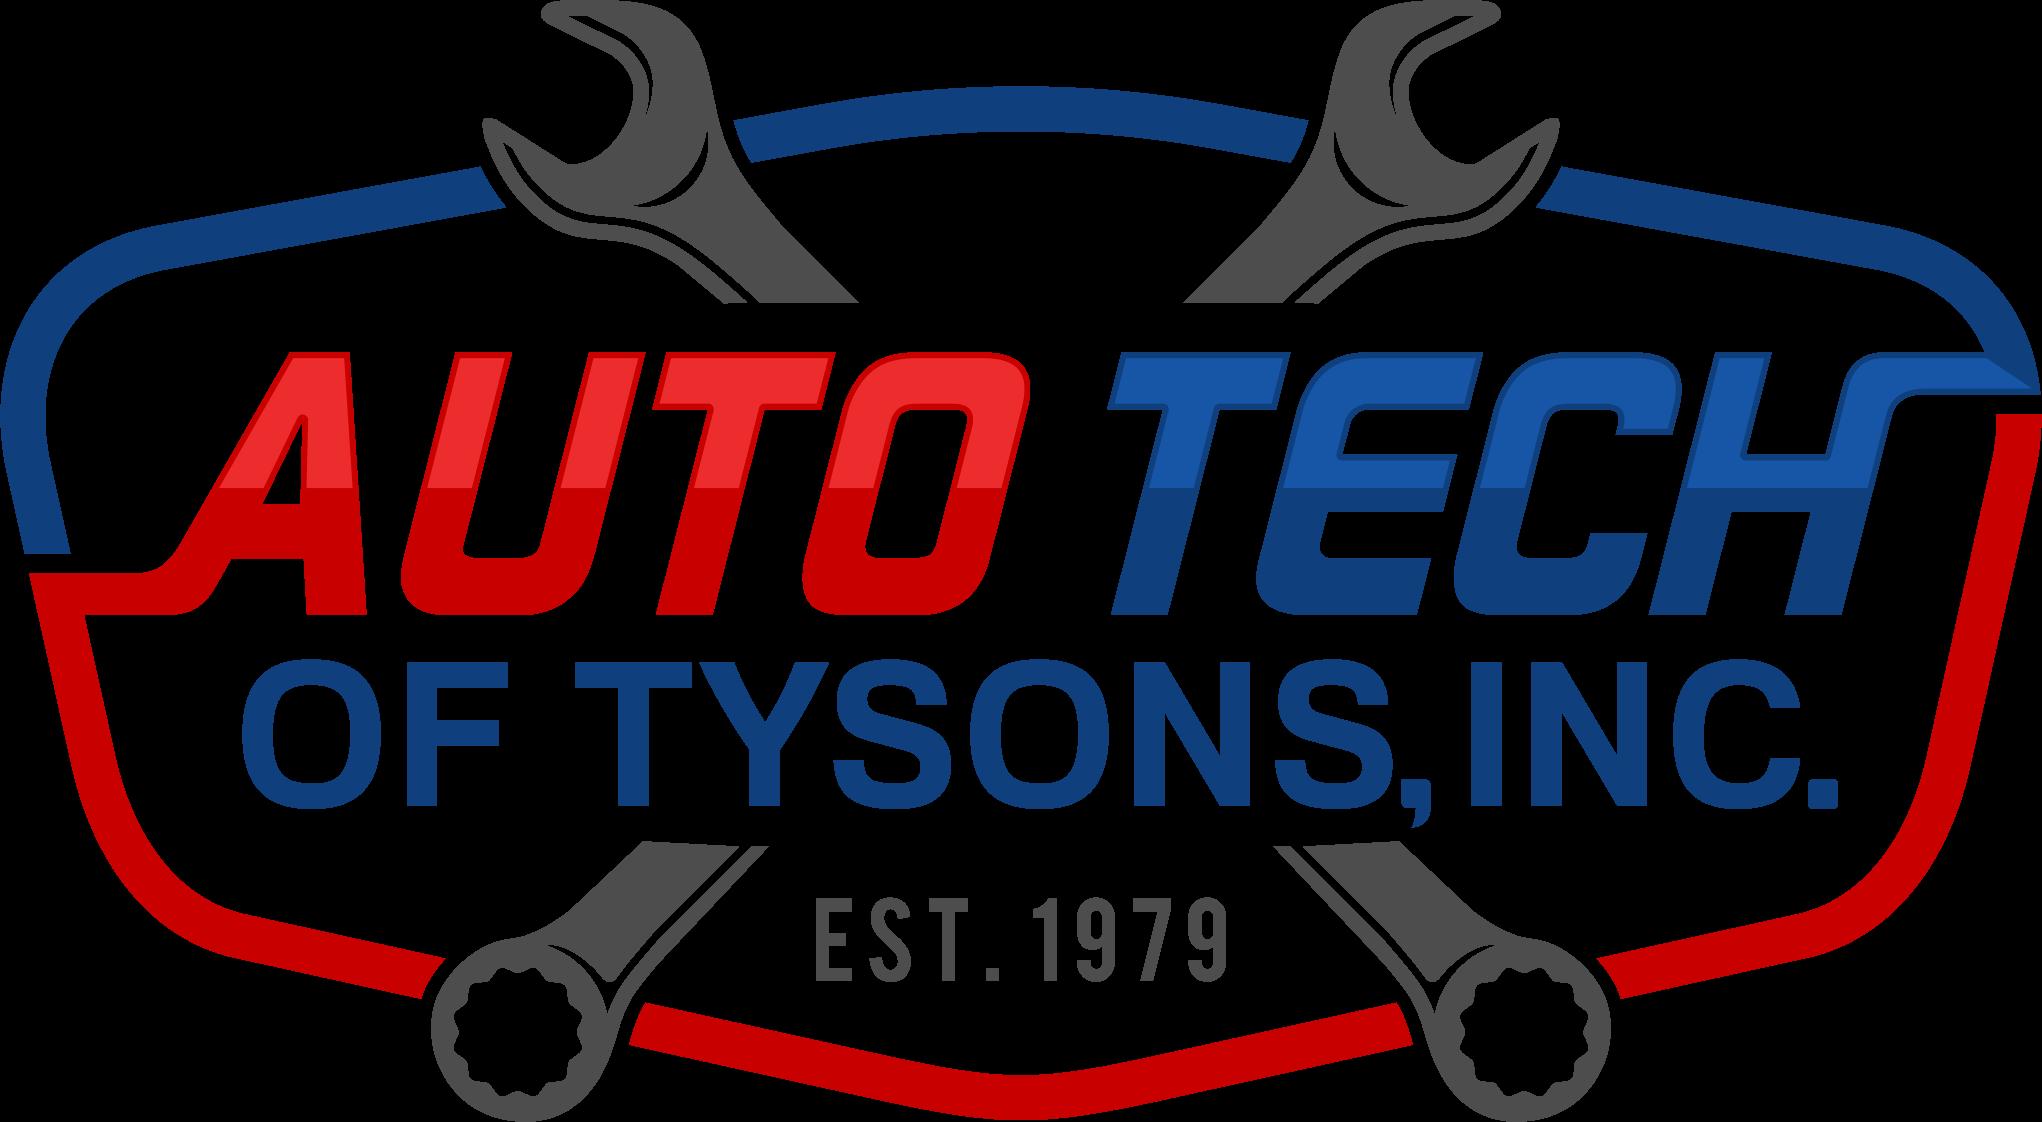 Auto Tech of Tysons, Inc.